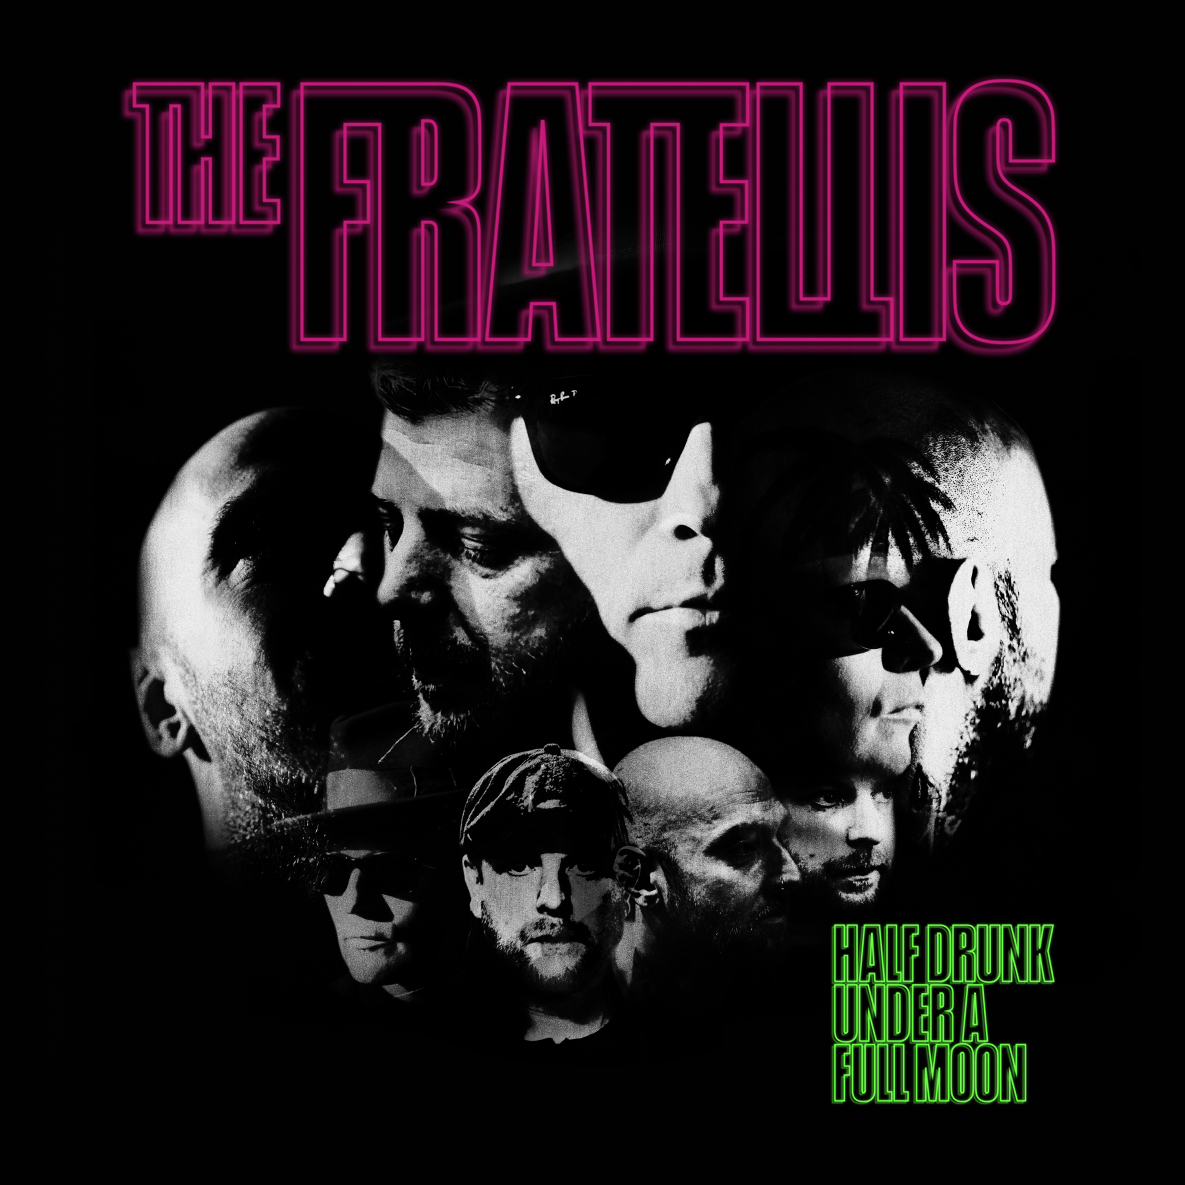 Buy Online The Fratellis - Half Drunk Under A Full Moon Deluxe Digital Album (Inc. 7 x Bonus Tracks)